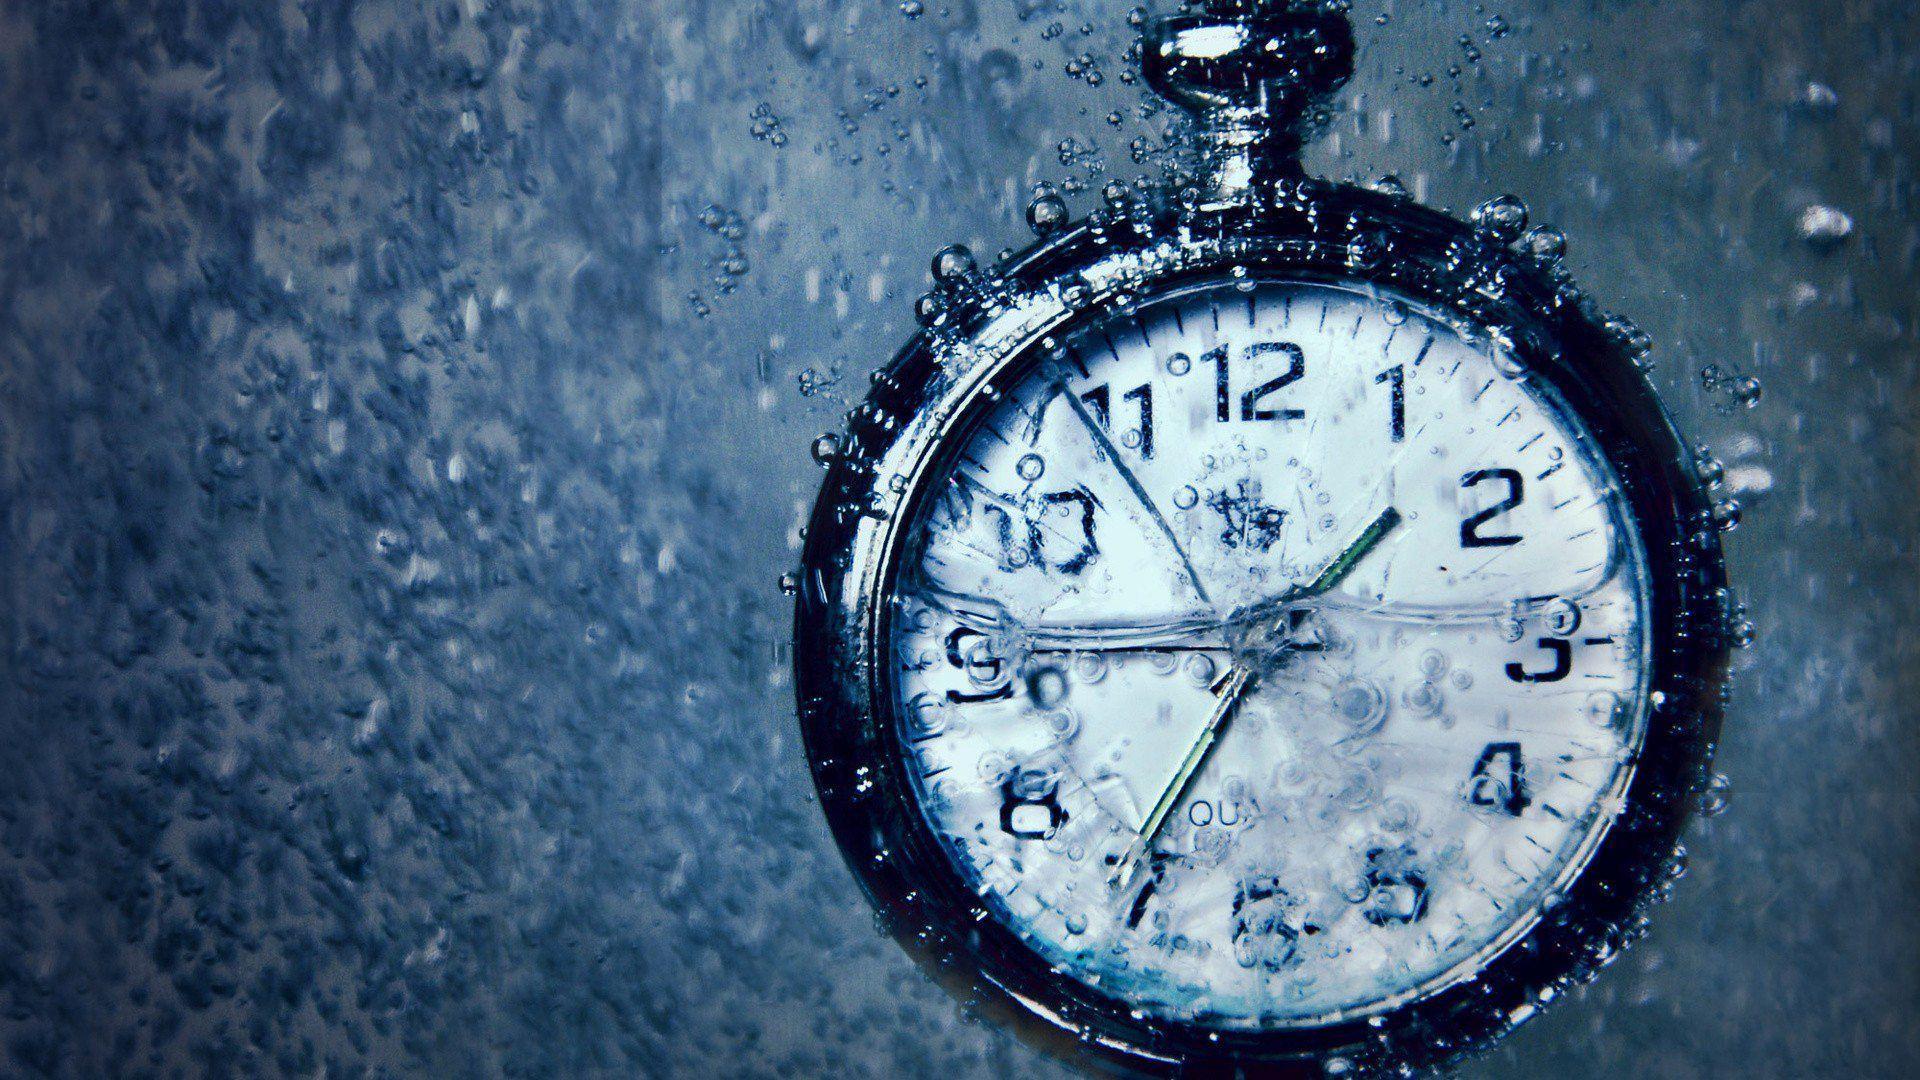 hd, pocket, rain, watch Wallpaper 1920x1080